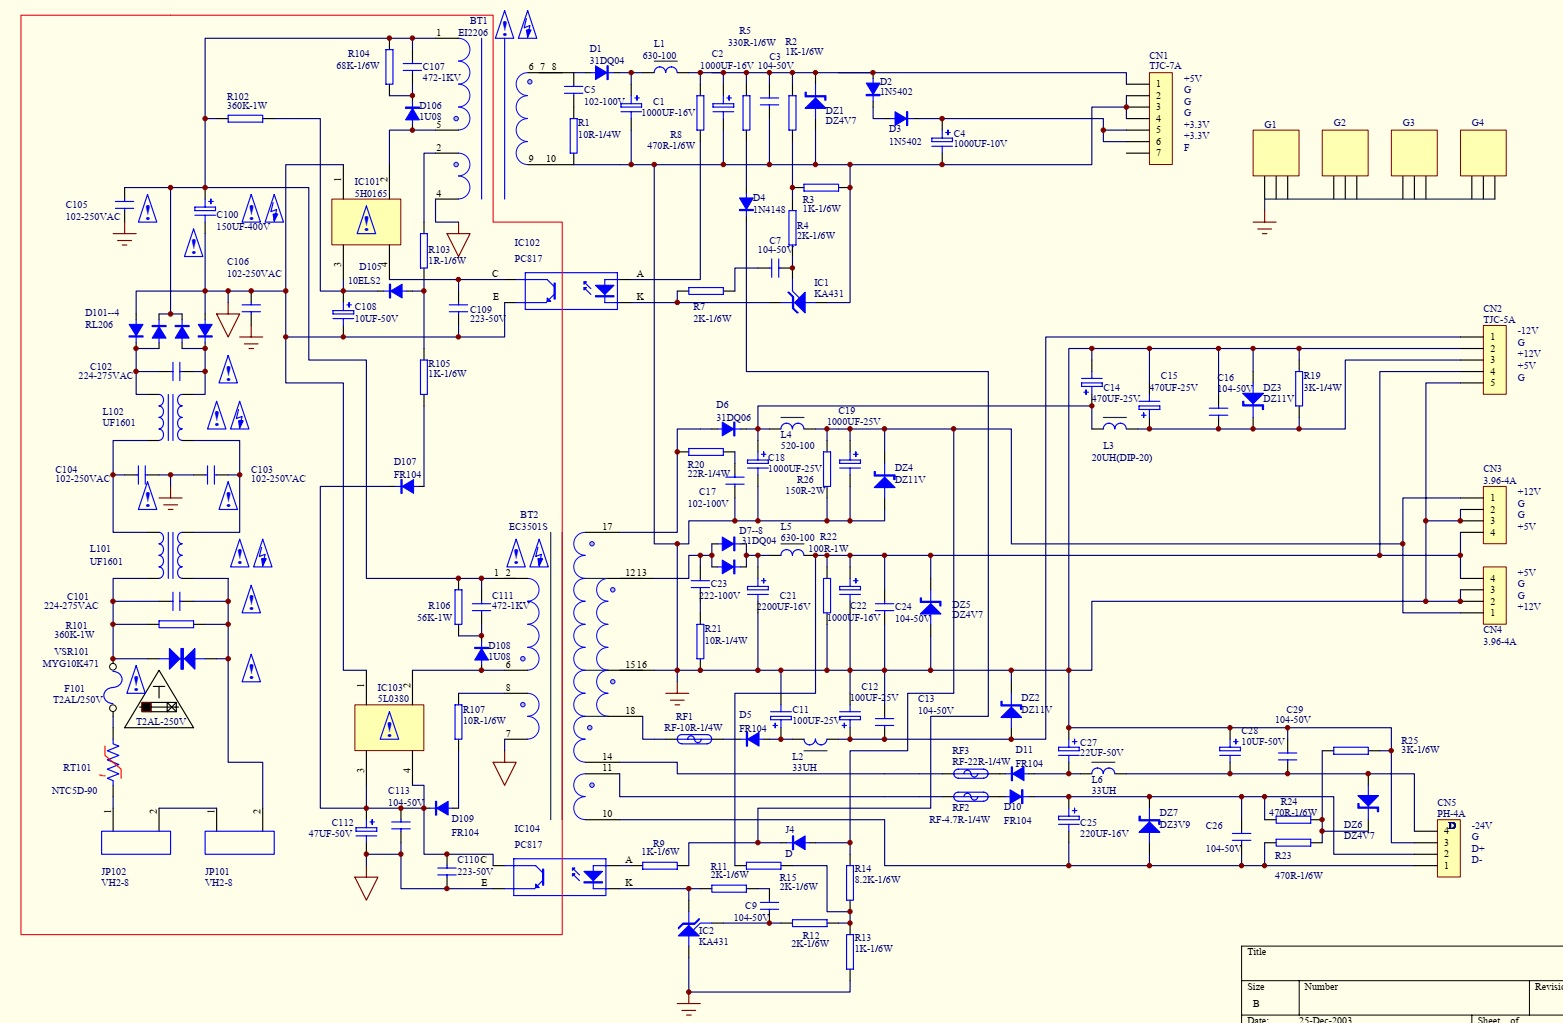 medium resolution of belson lcd tv powell i es6128 es7010 circuit diagram schematic full